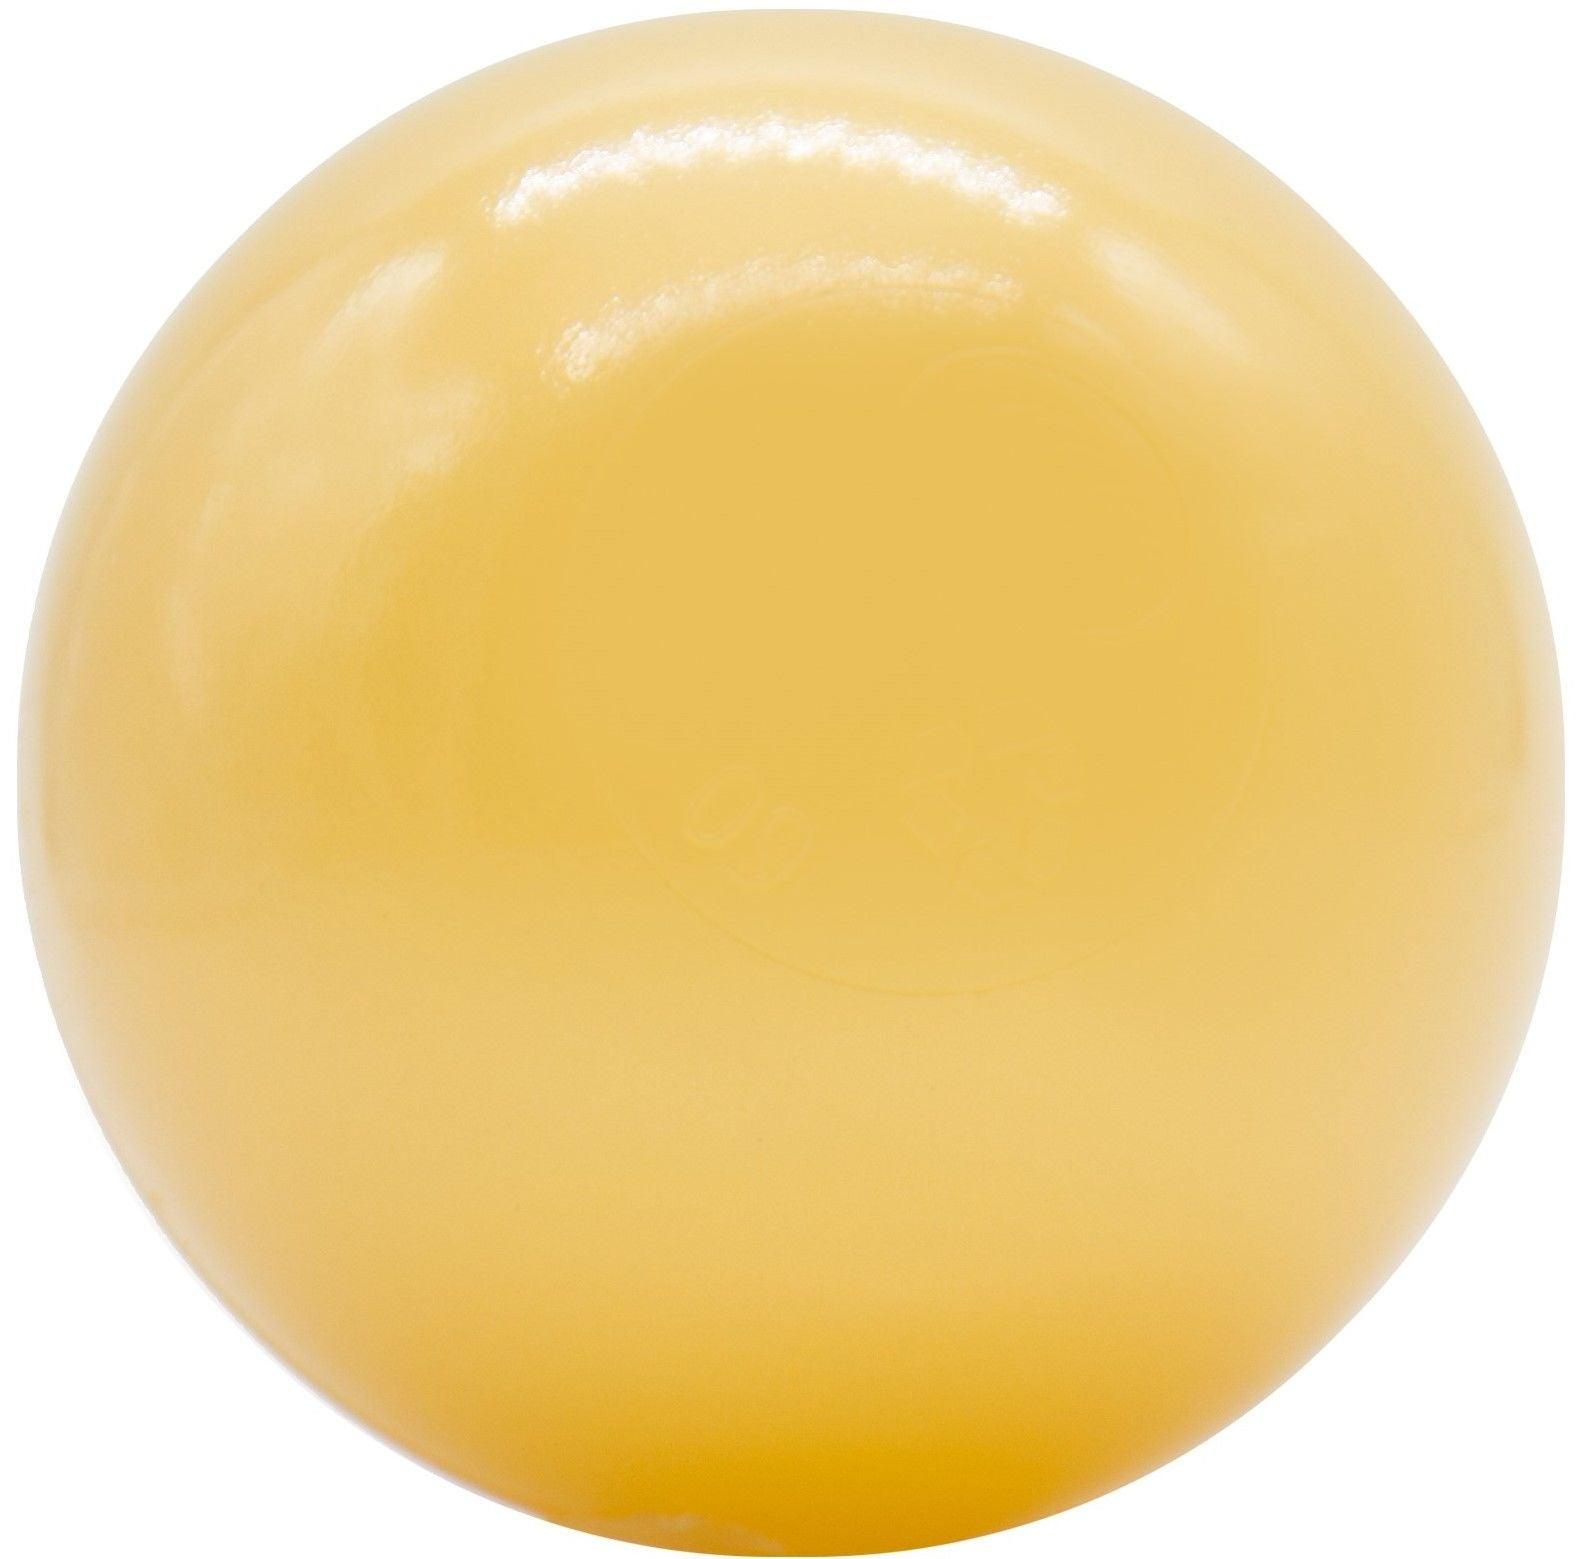 KIDKII Extra Bollar 50 st, Gold